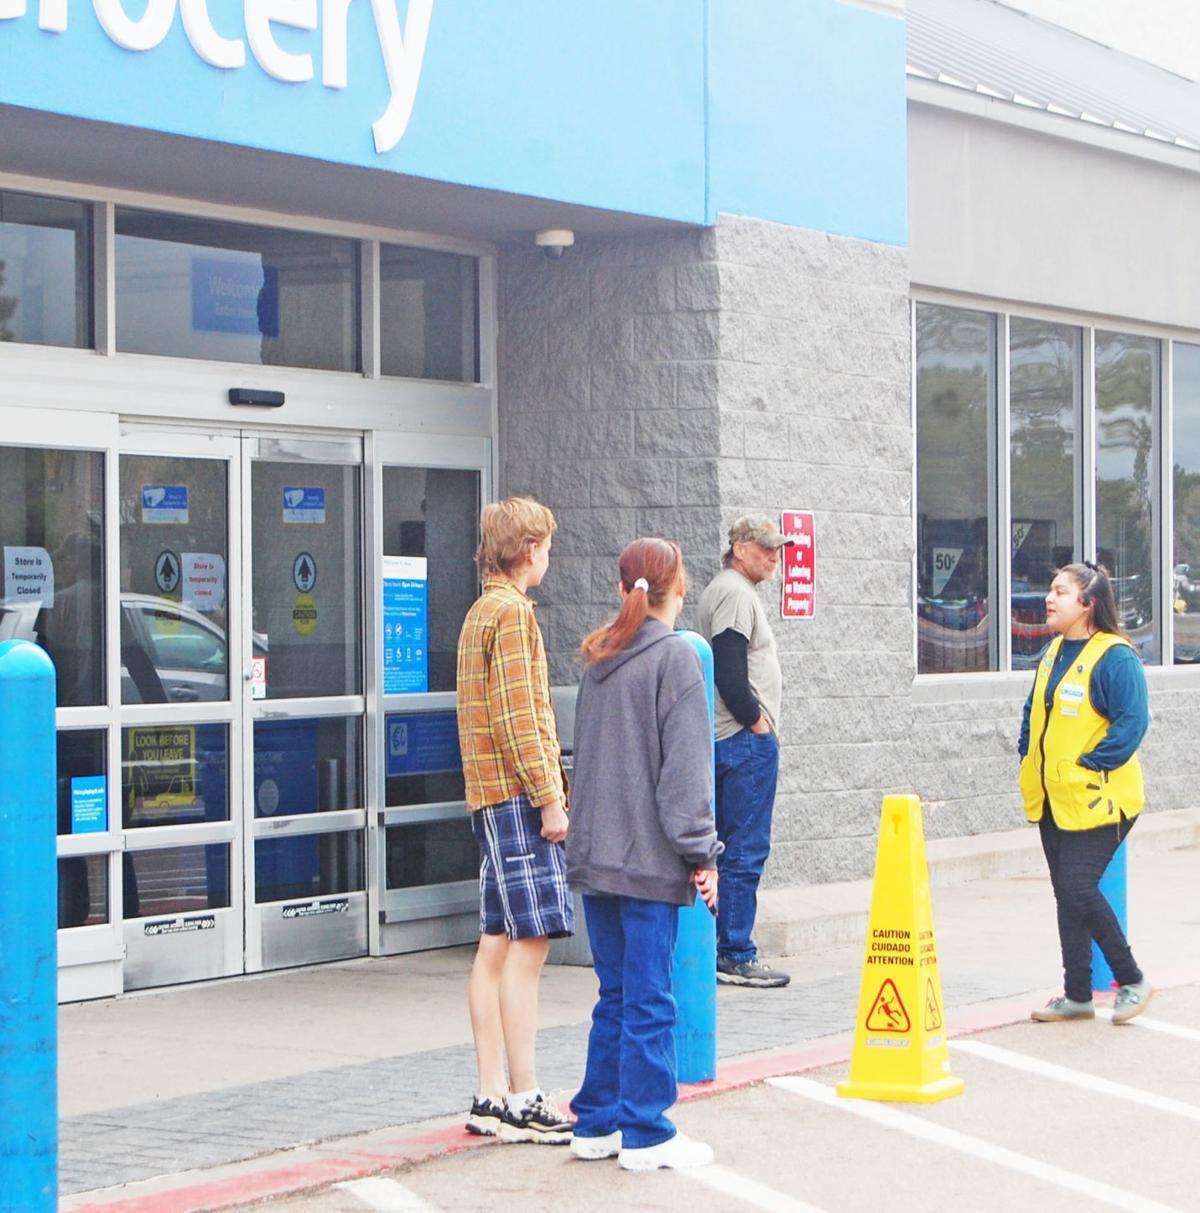 Walmart closed this morning